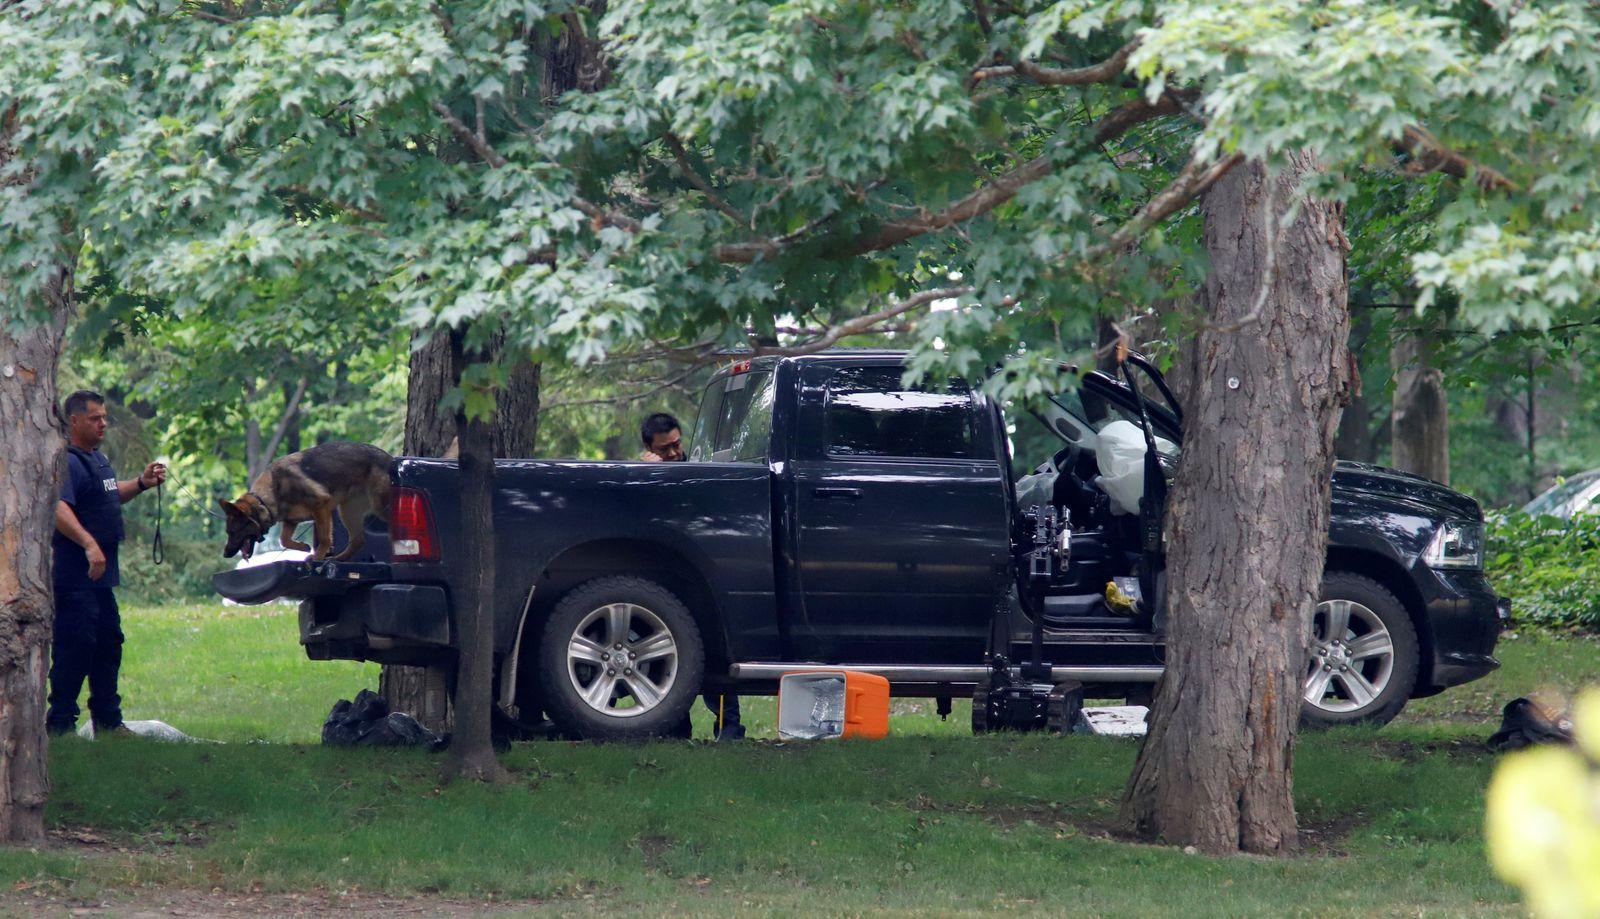 A police dog searches a vehicle at Rideau Hallin Ottawa